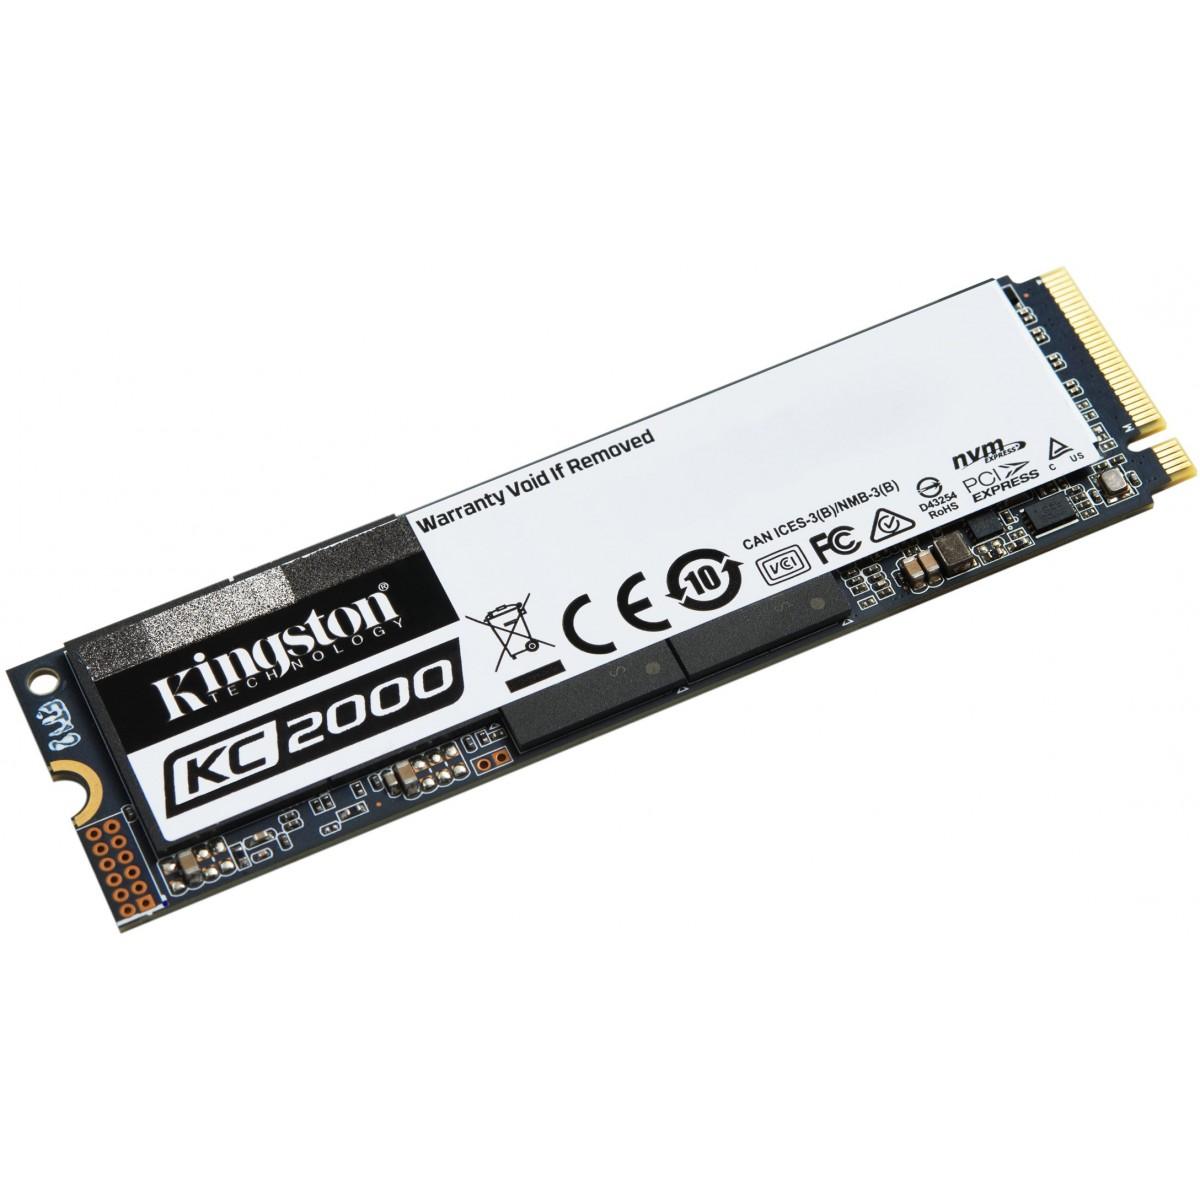 SSD Kingston KC2000, M.2 2280, 1TB, Leitura 3200MBs e Gravação 2200MBs, SKC2000M8/1000G